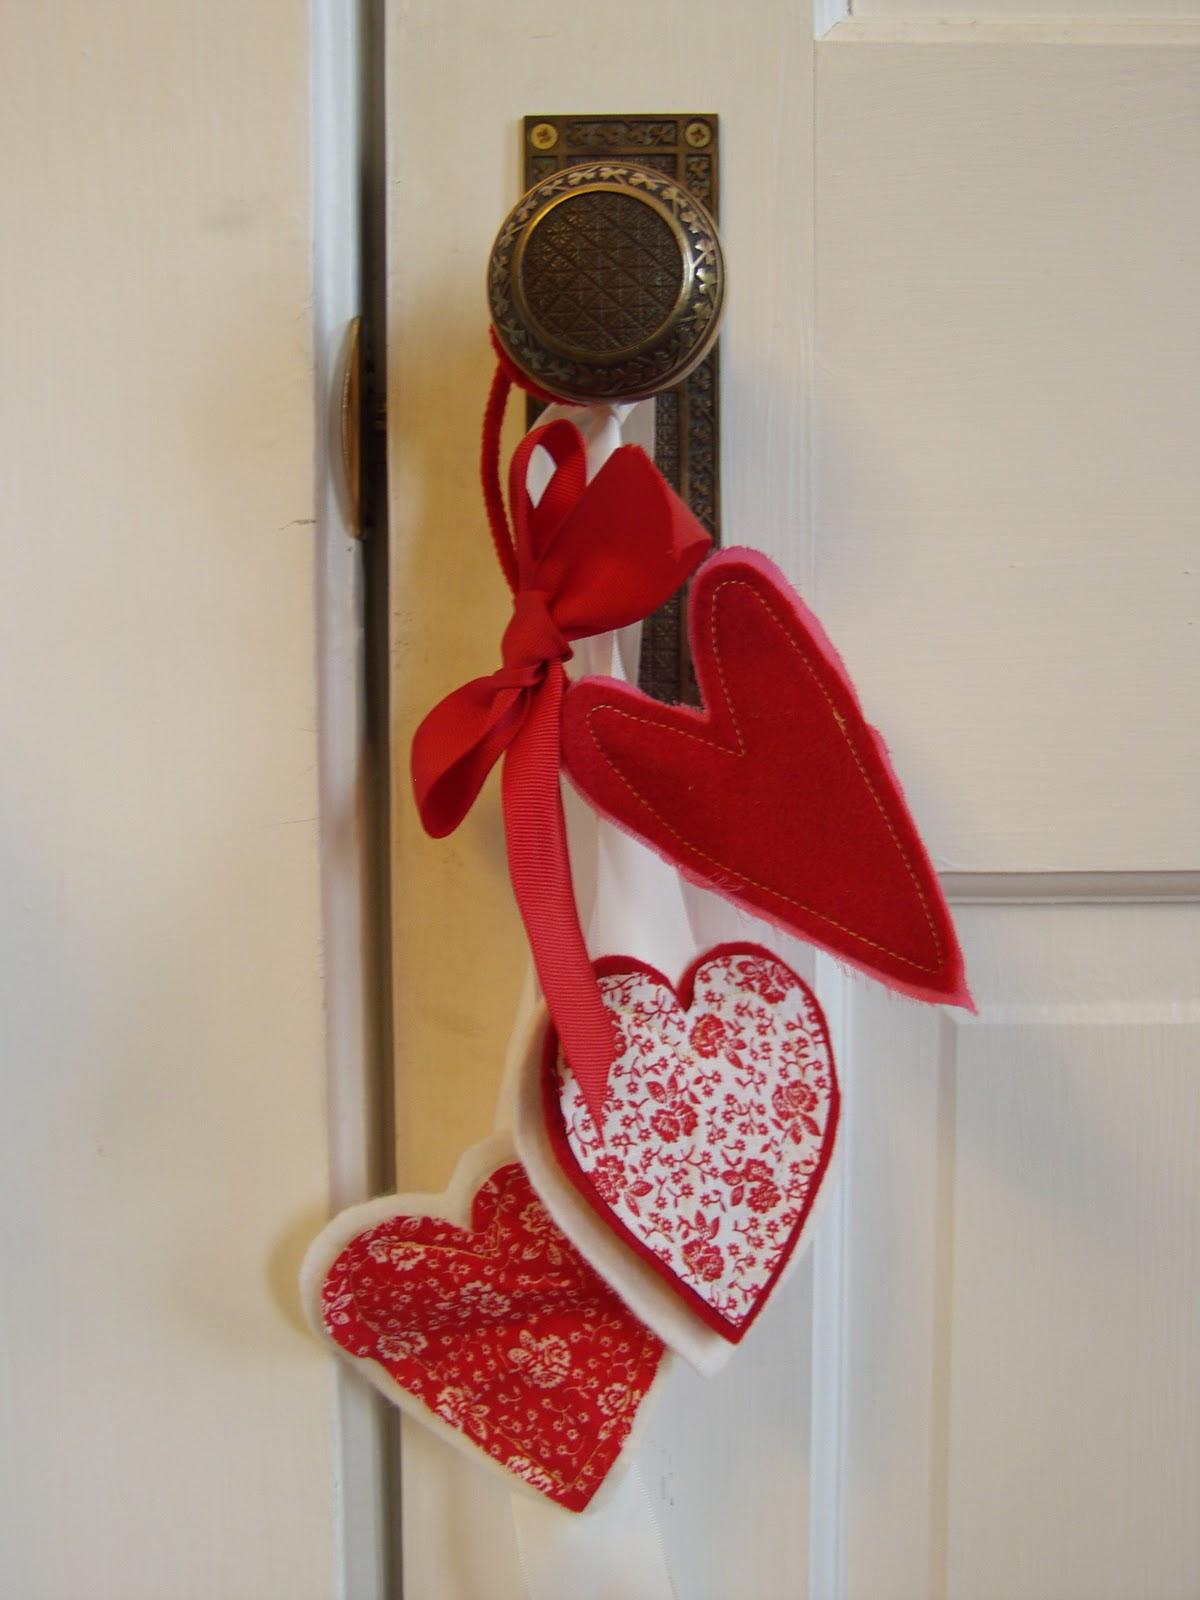 door knob decorations photo - 6